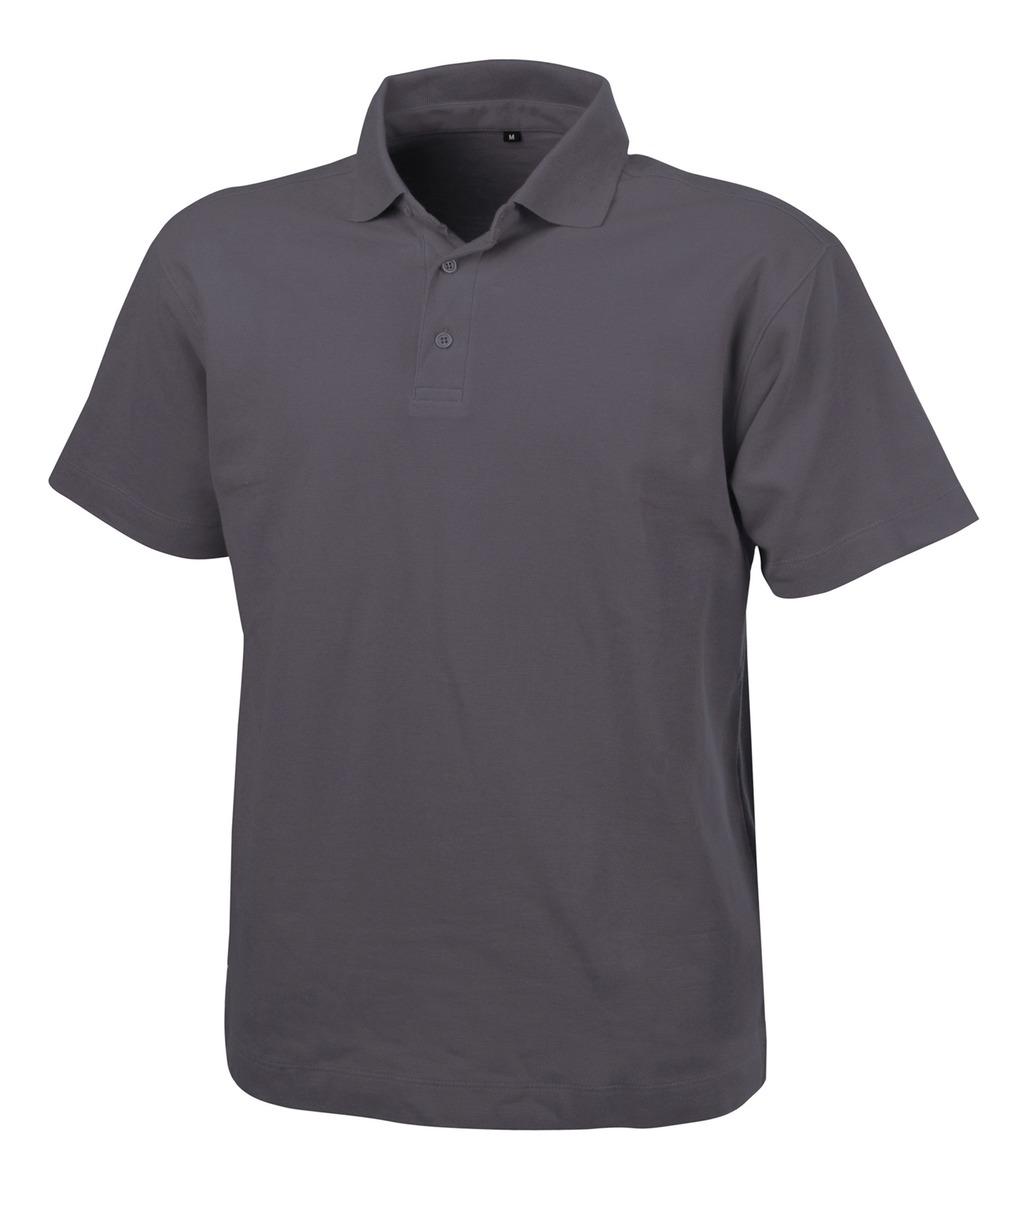 LEON Poloshirt